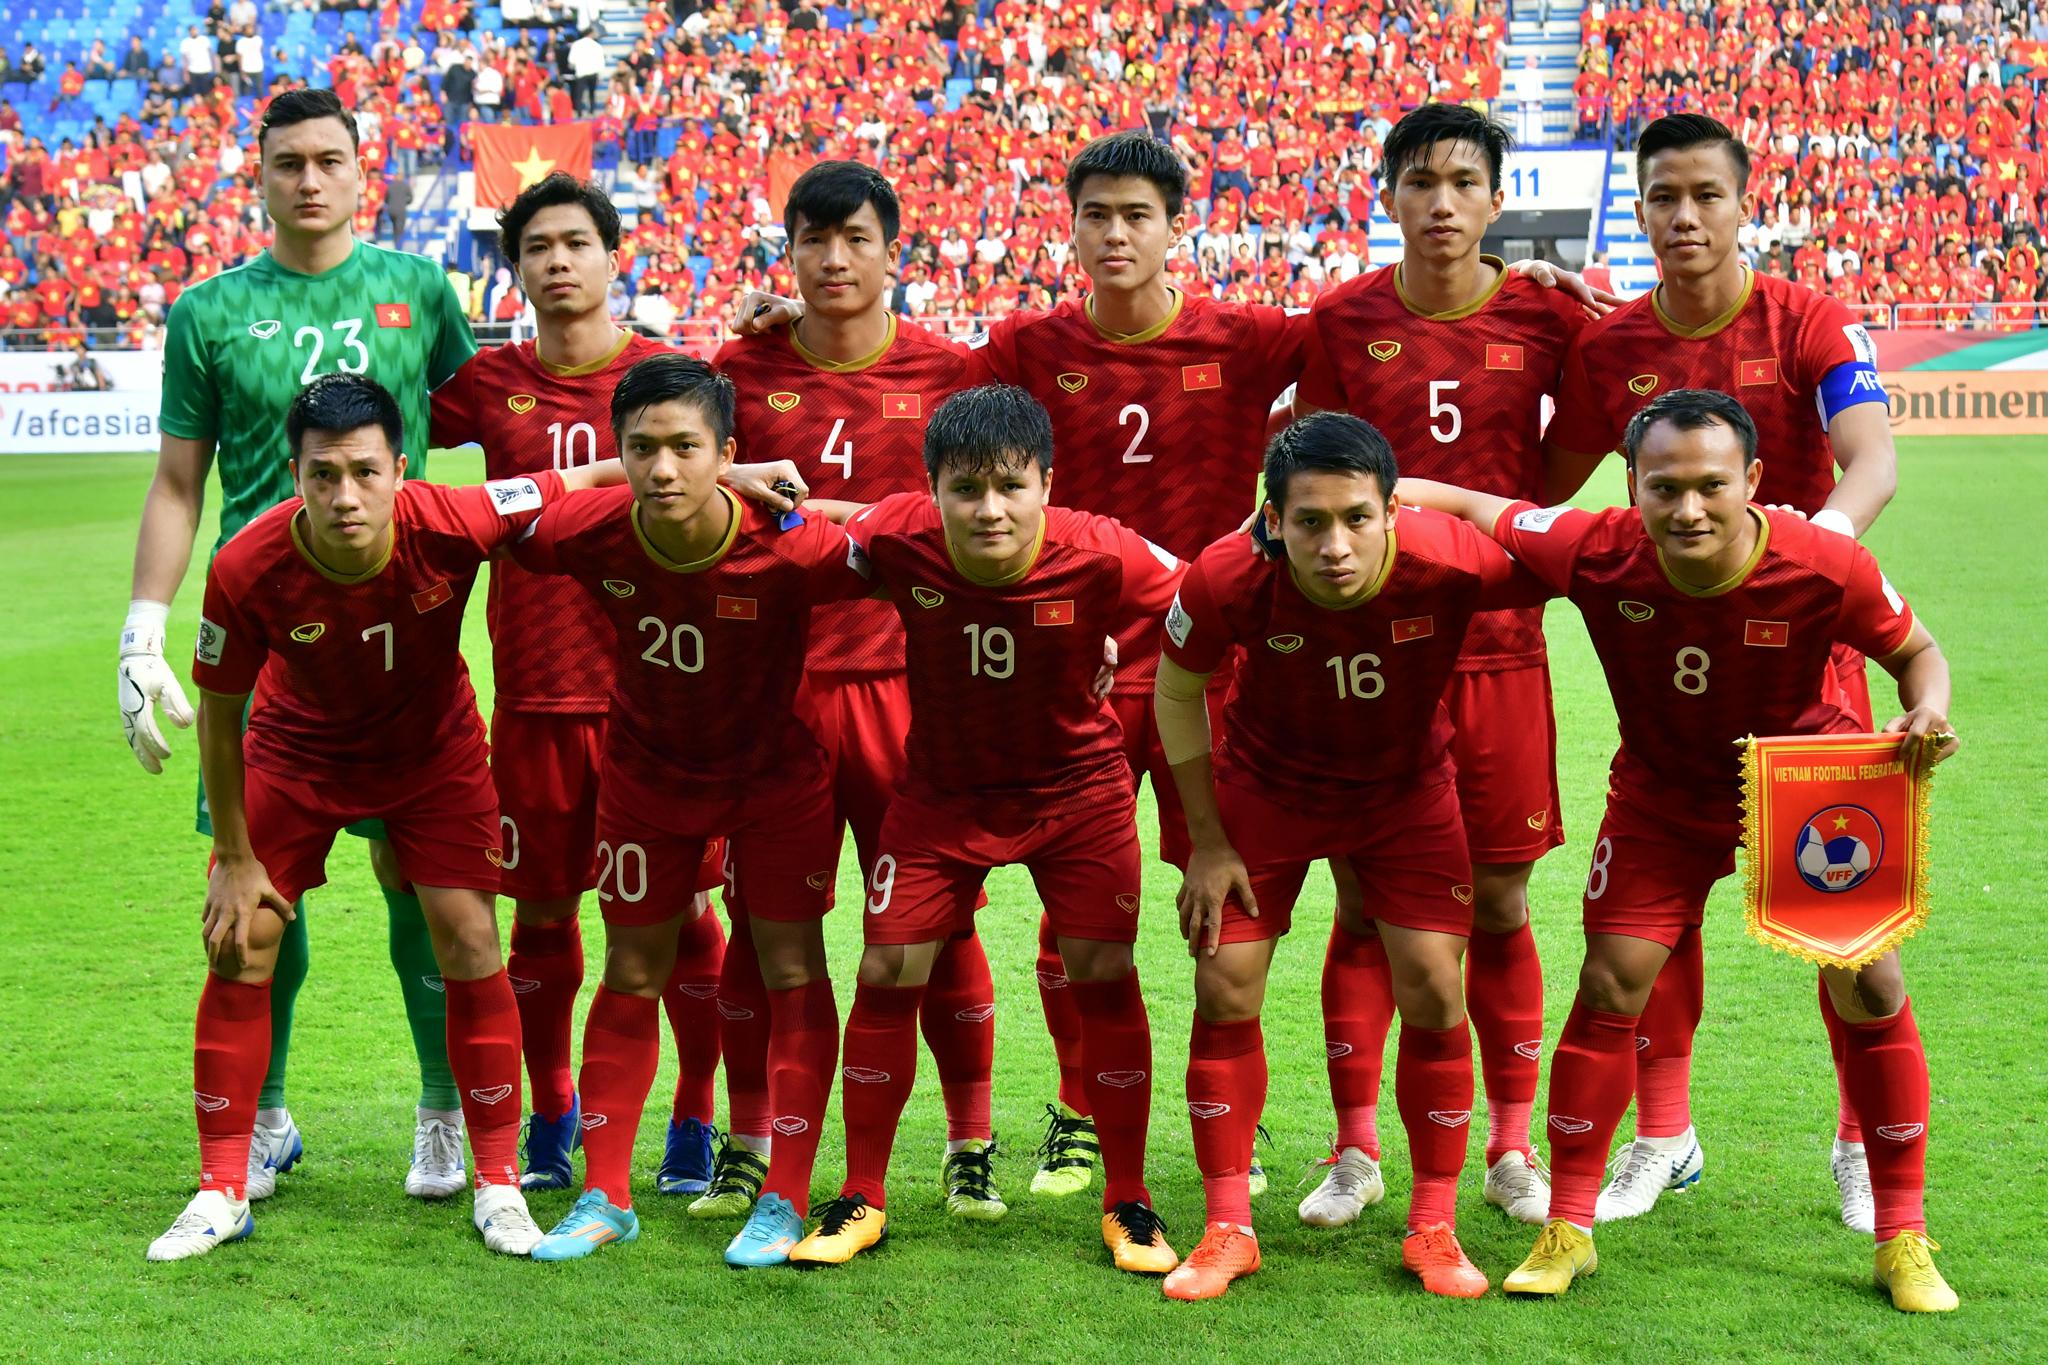 new concept 0187d 1870f Vietnam National Team Players Become Ambassadors for ...